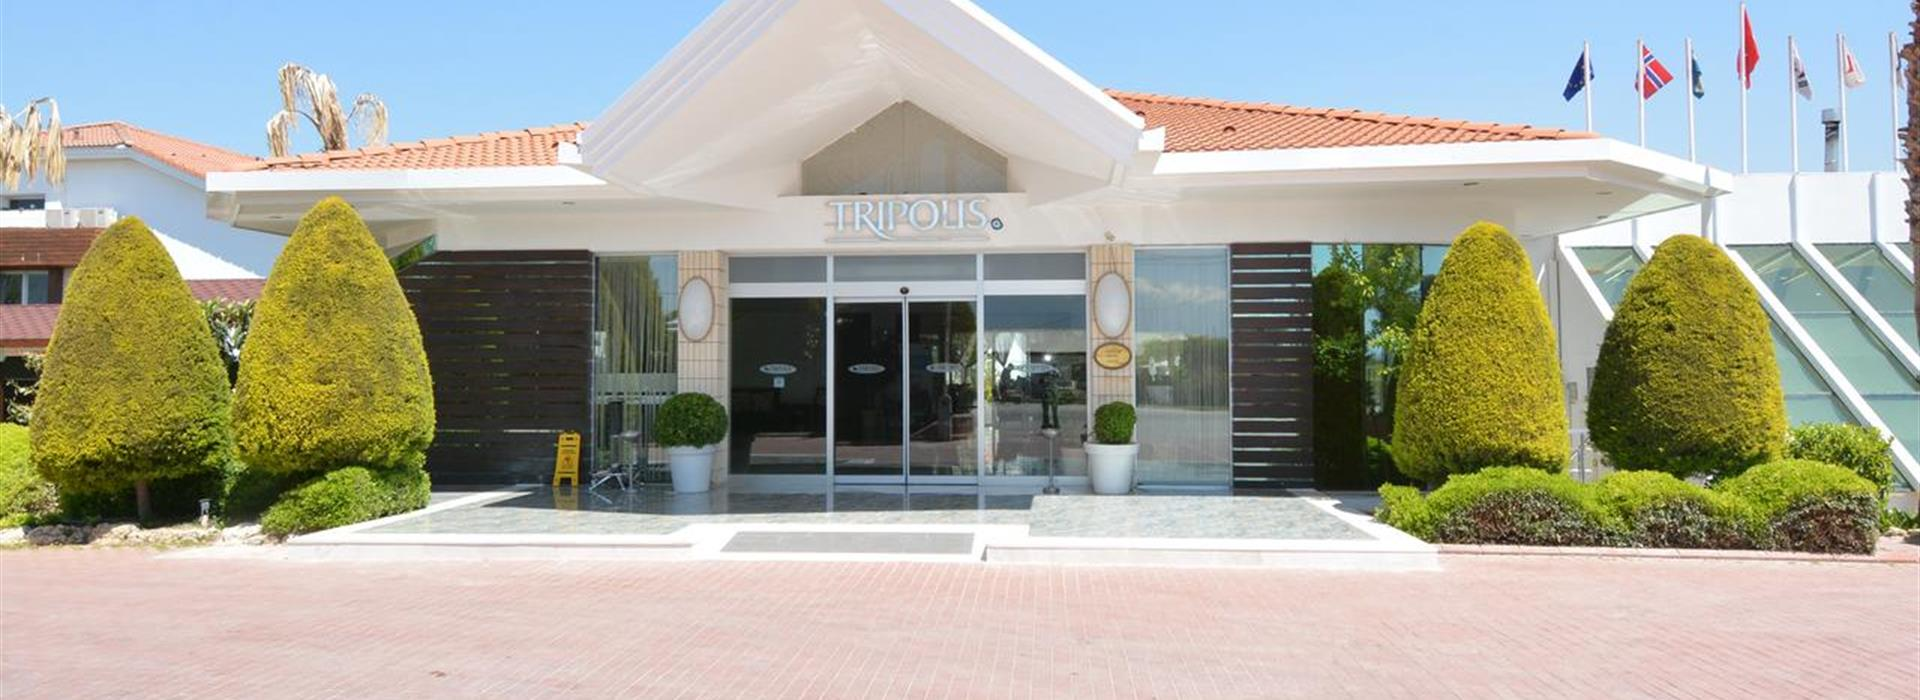 tripolis-hotel